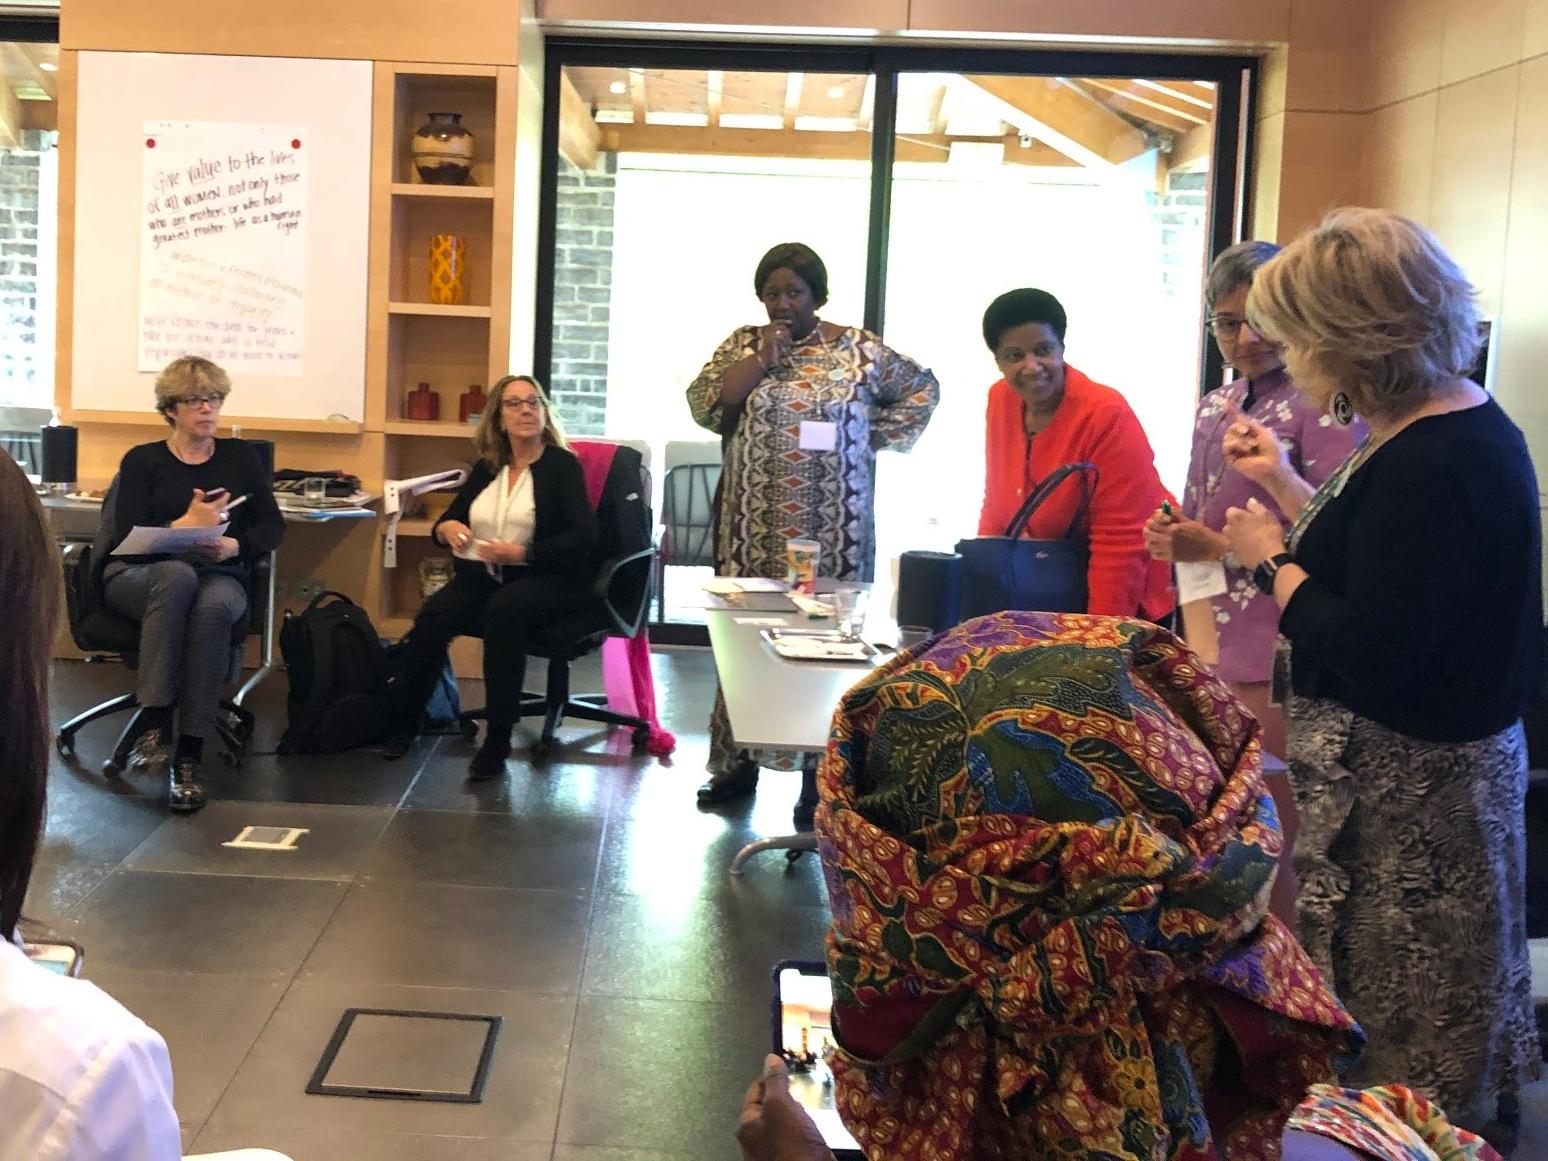 (l-r) Laura Flanders, Peggy Clark, Dr. Agnes Binagwaho, Phumzile Mlambo-Ngcuka and Pat Mitchell